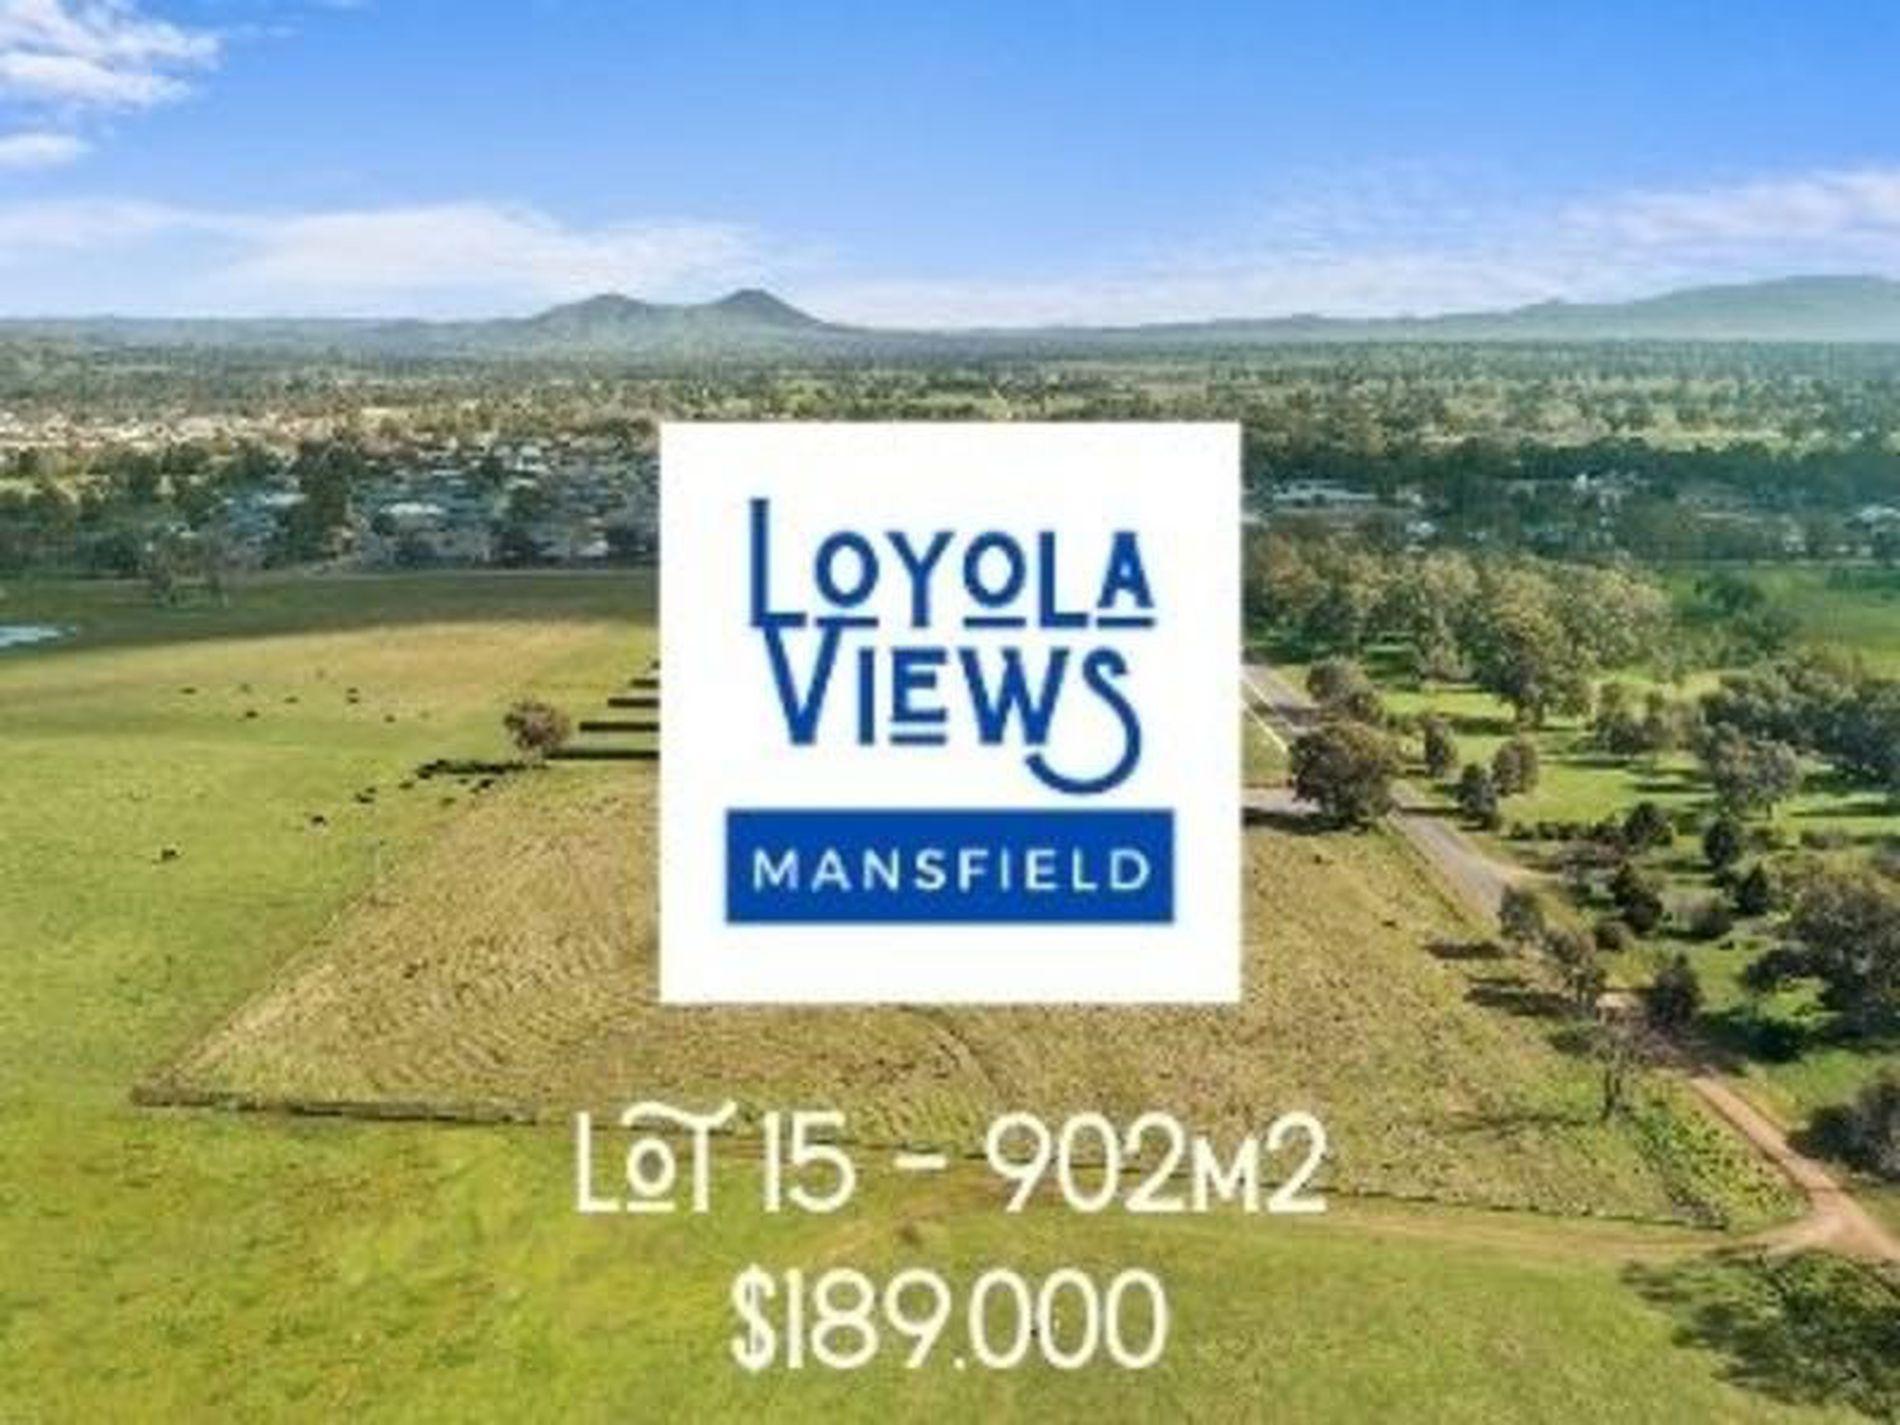 Lot 15, Loyola Views, Mansfield